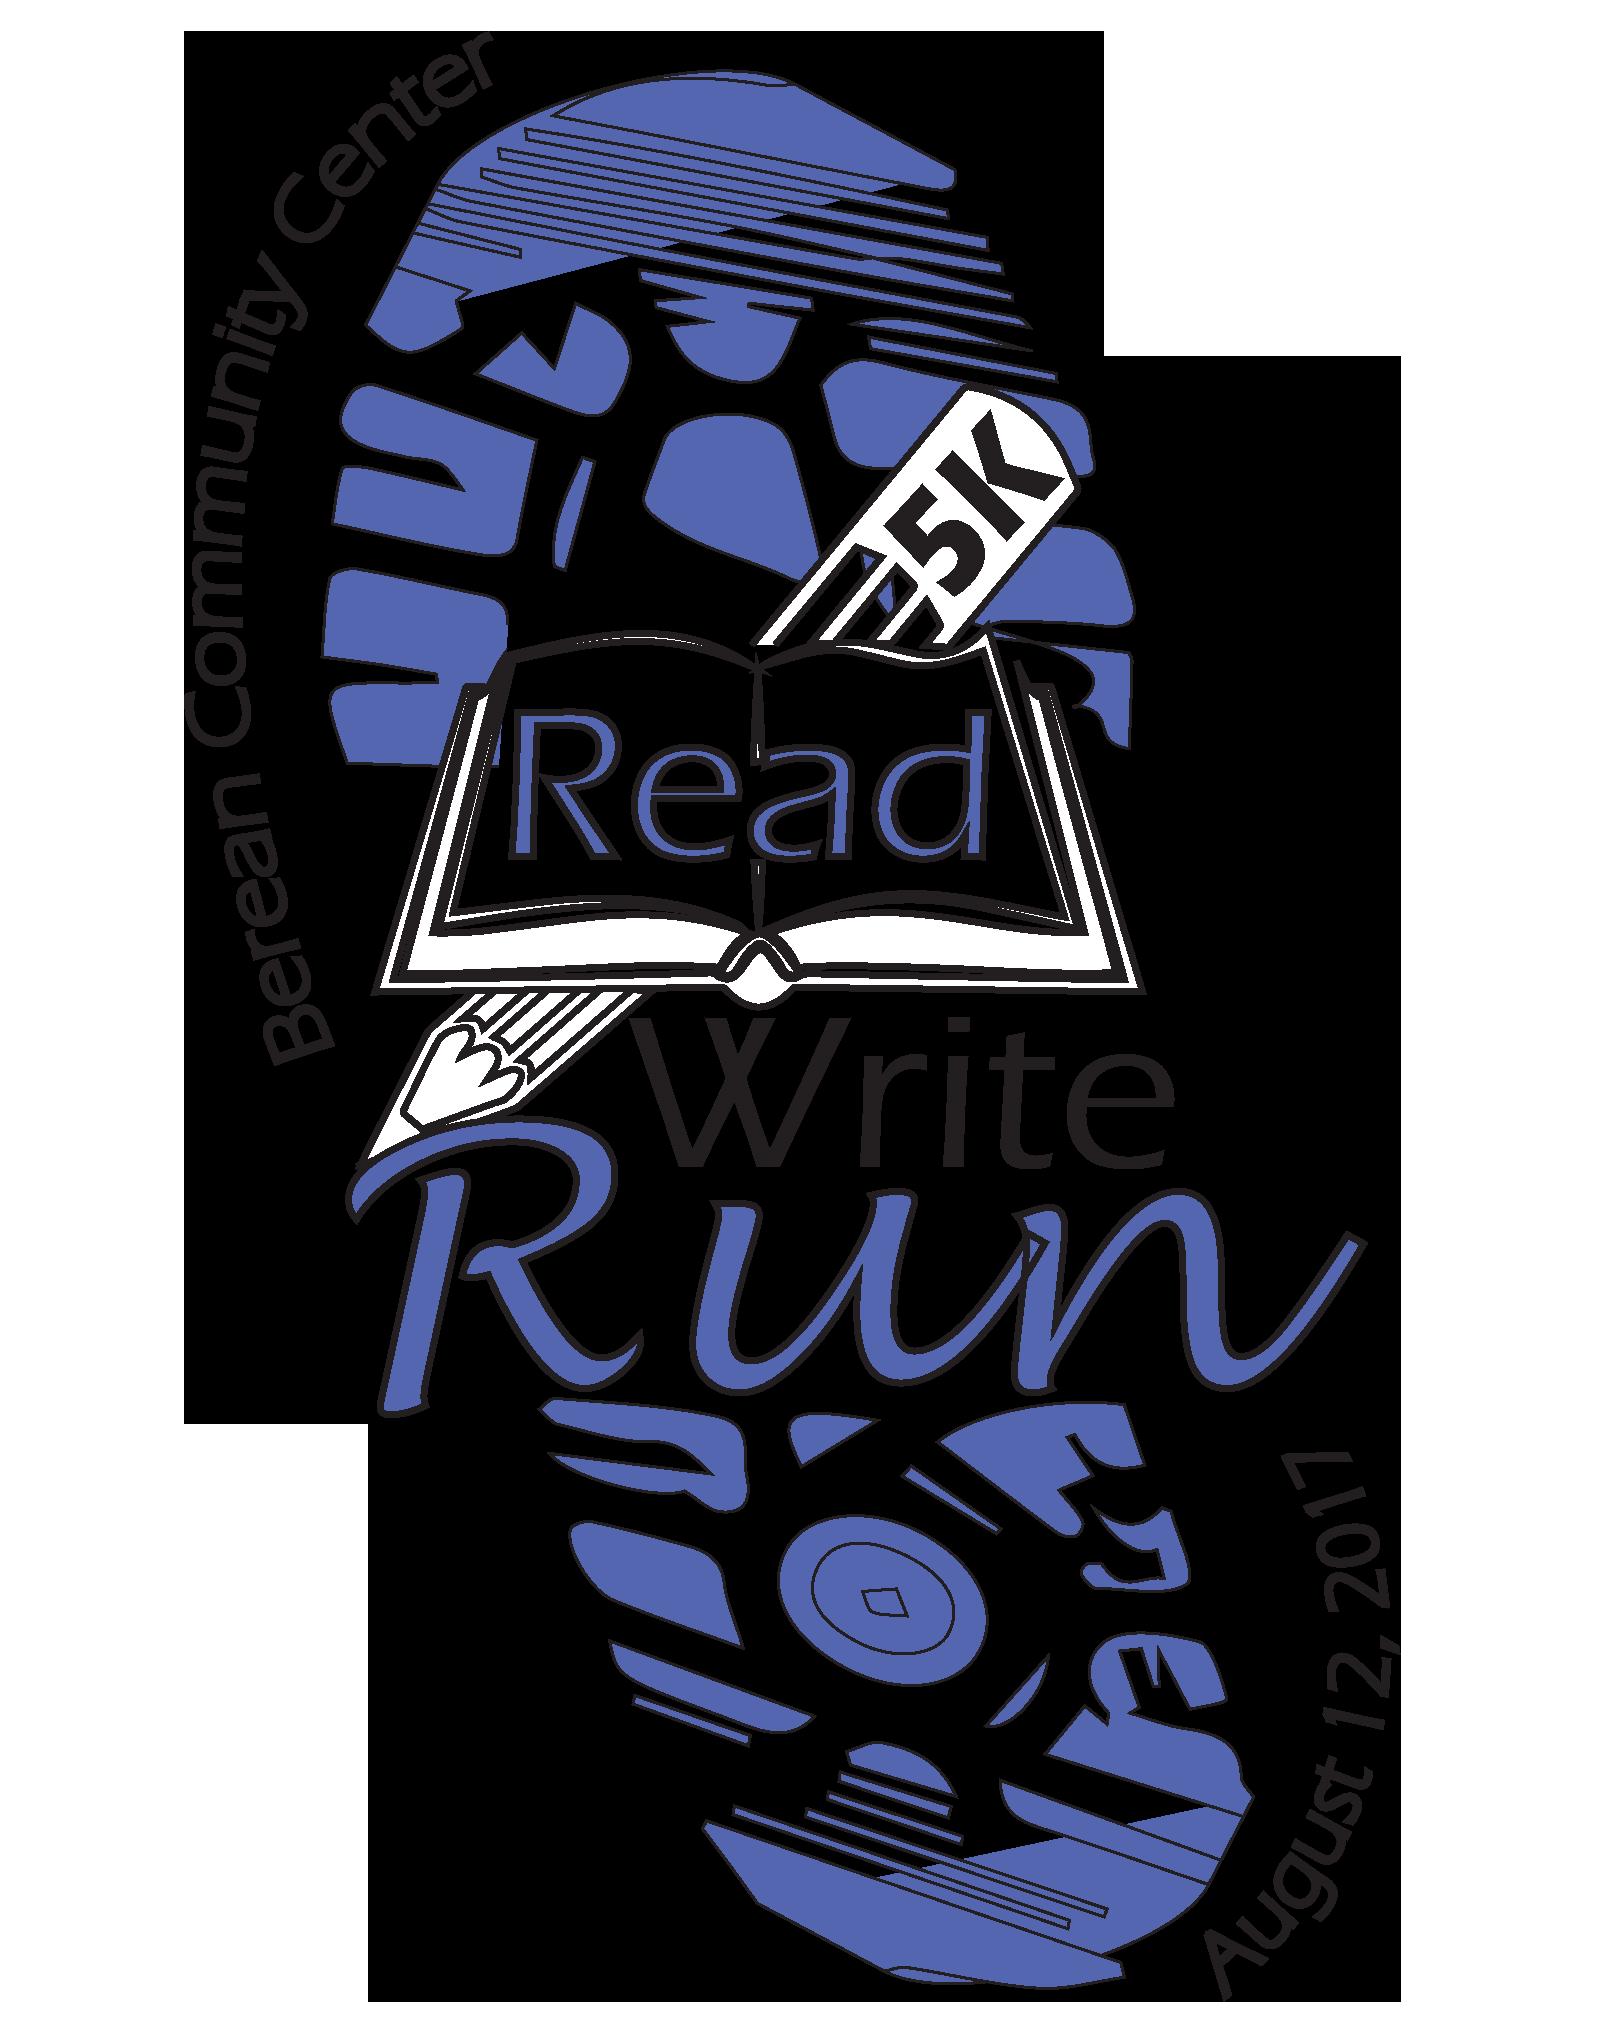 Read, Write, Run 5K